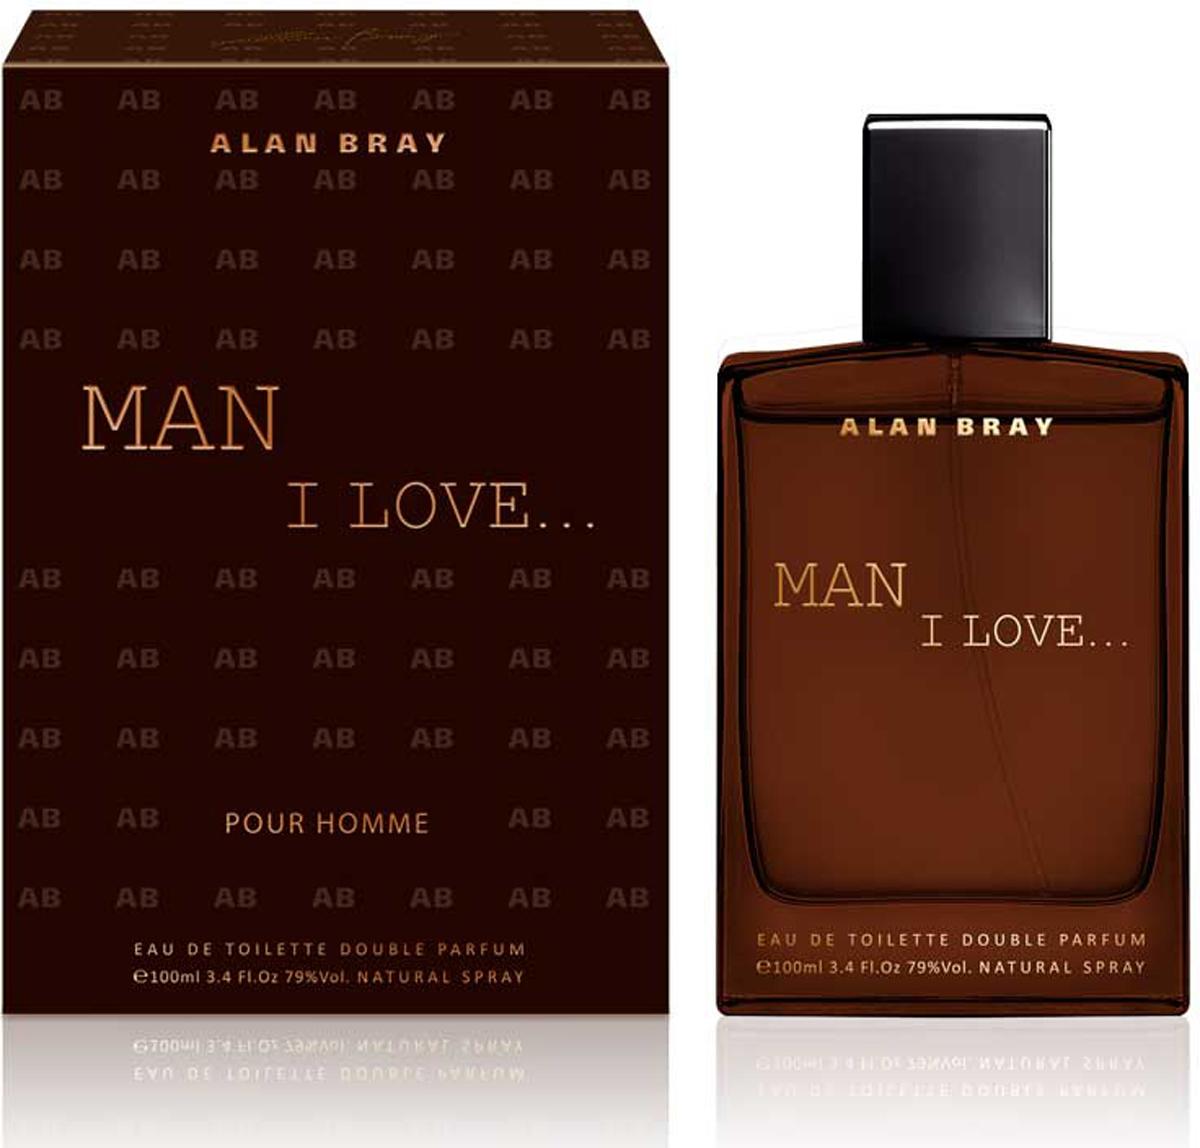 Alan Bray Туалетная вода Man I Love, 100 мл